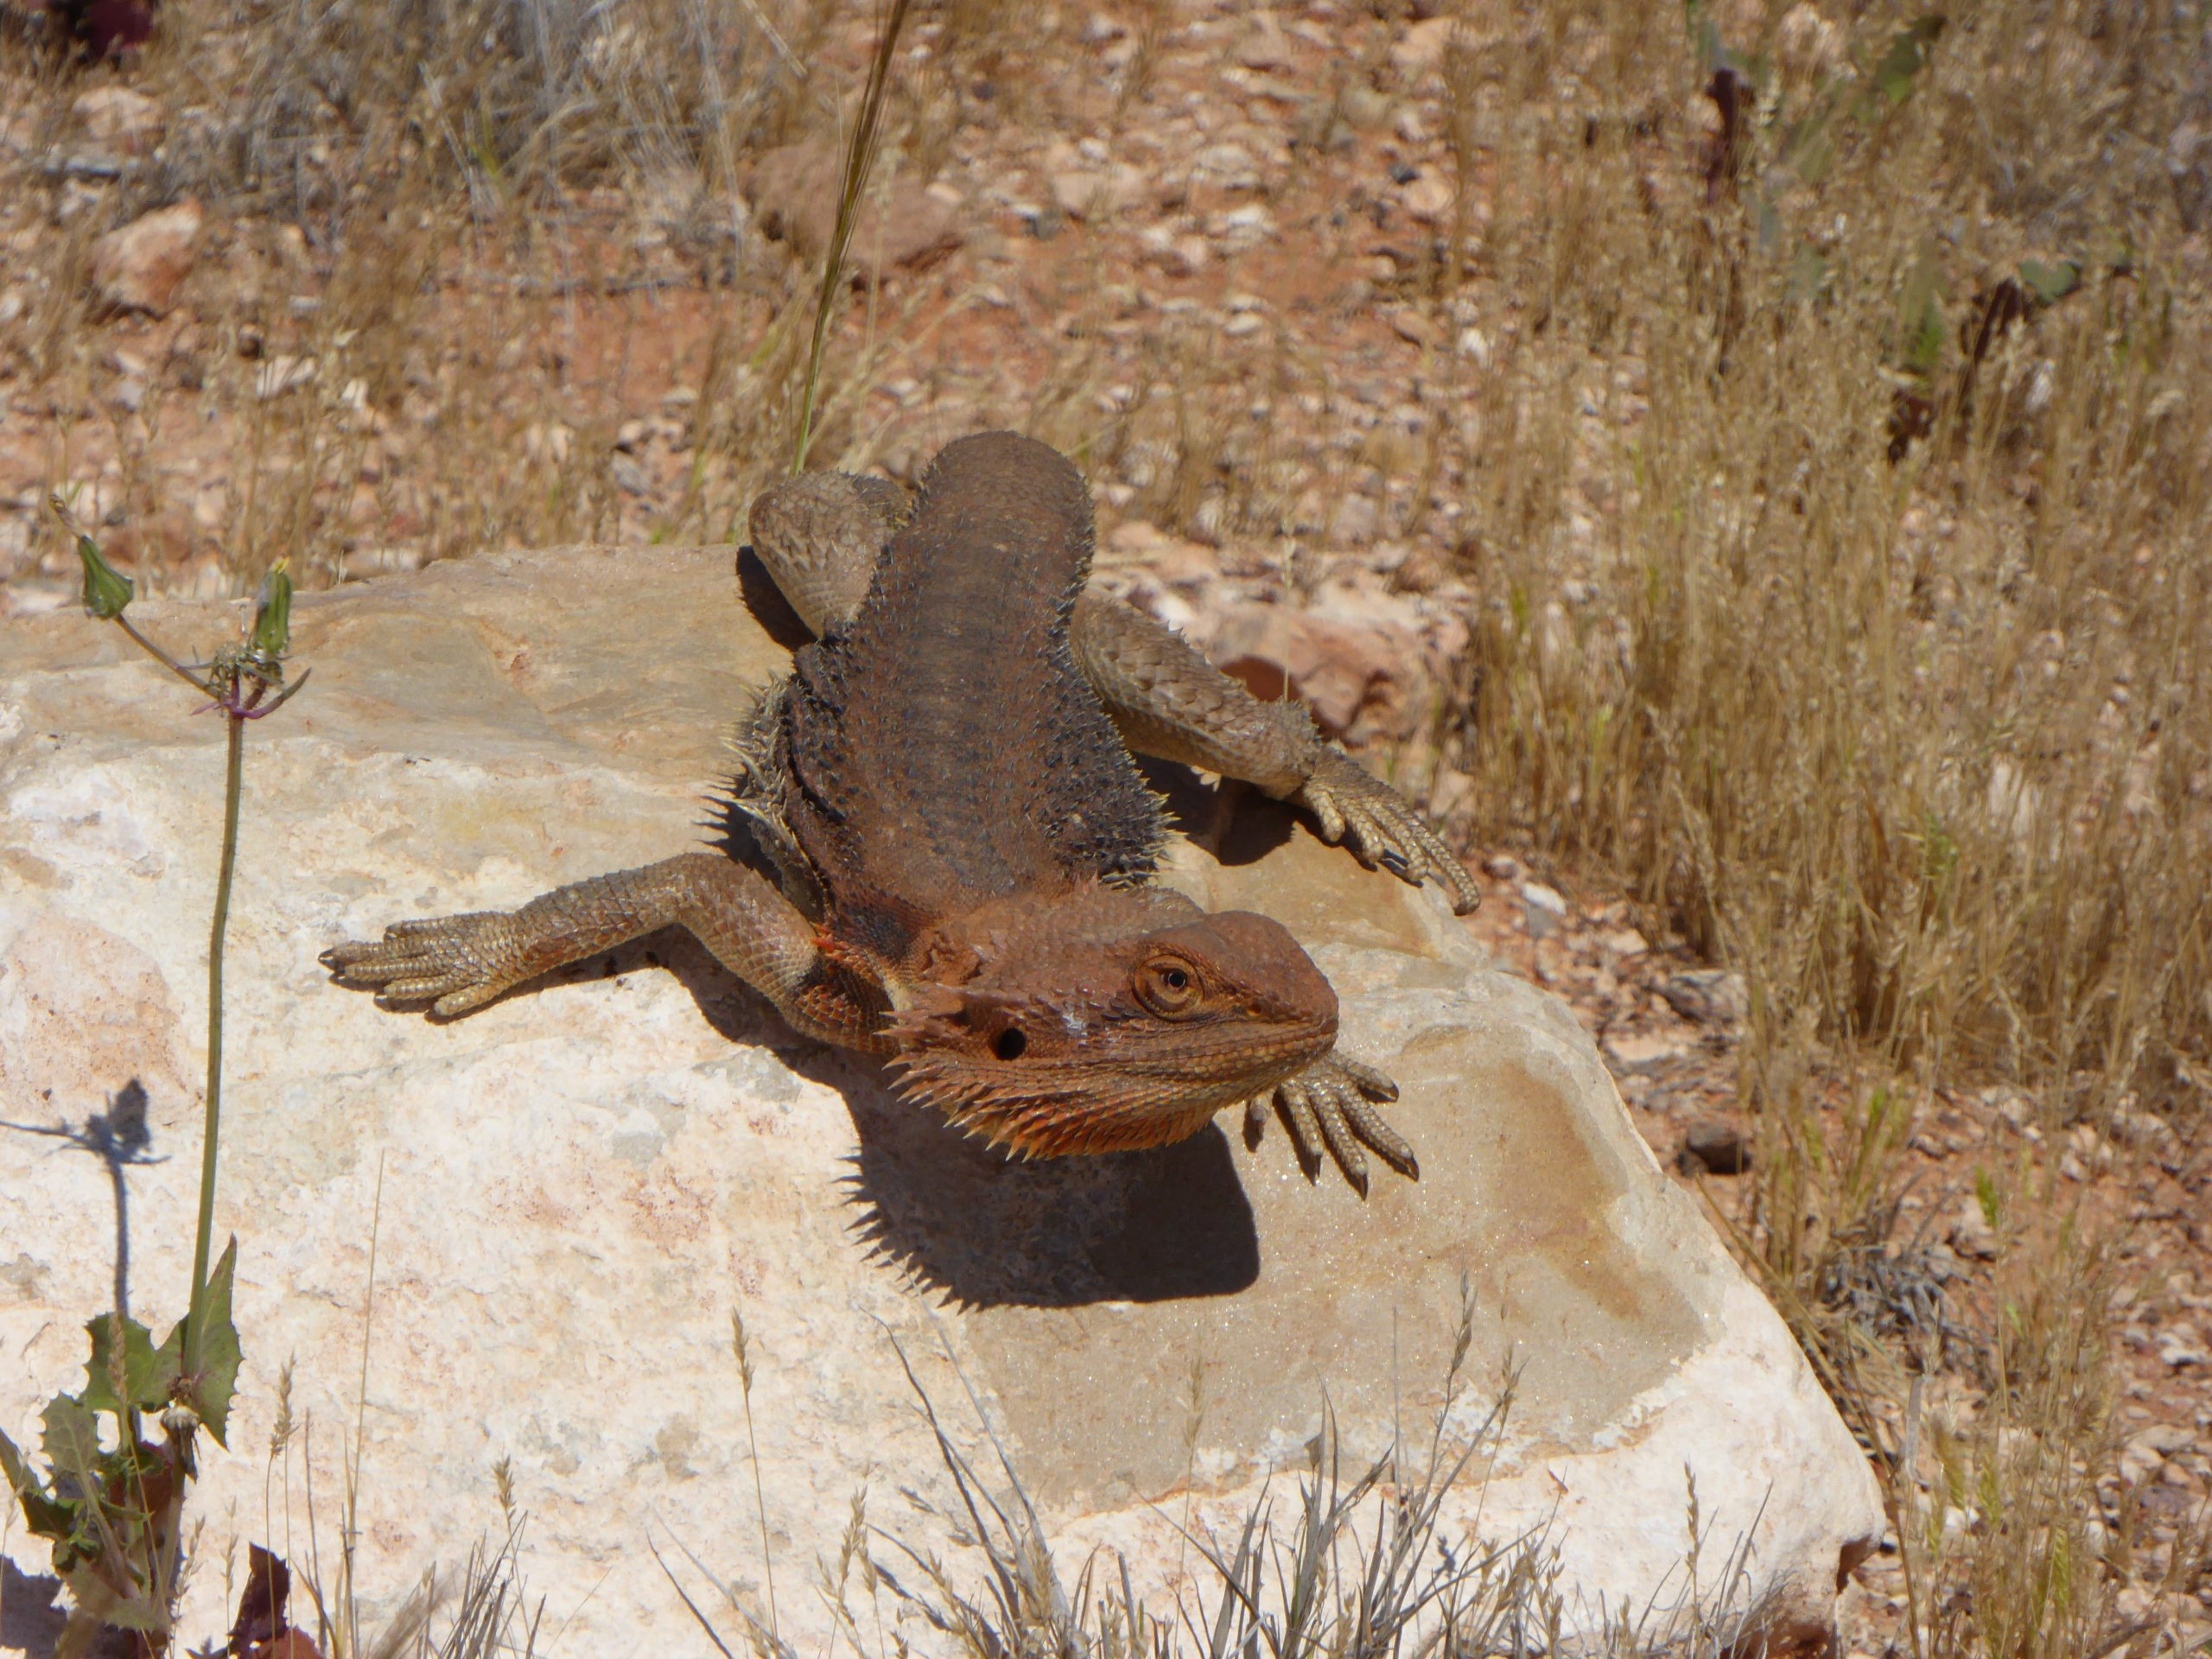 Radreise Australien 2016 - Streifenköpfige Bartagame (Pogona vitticeps)